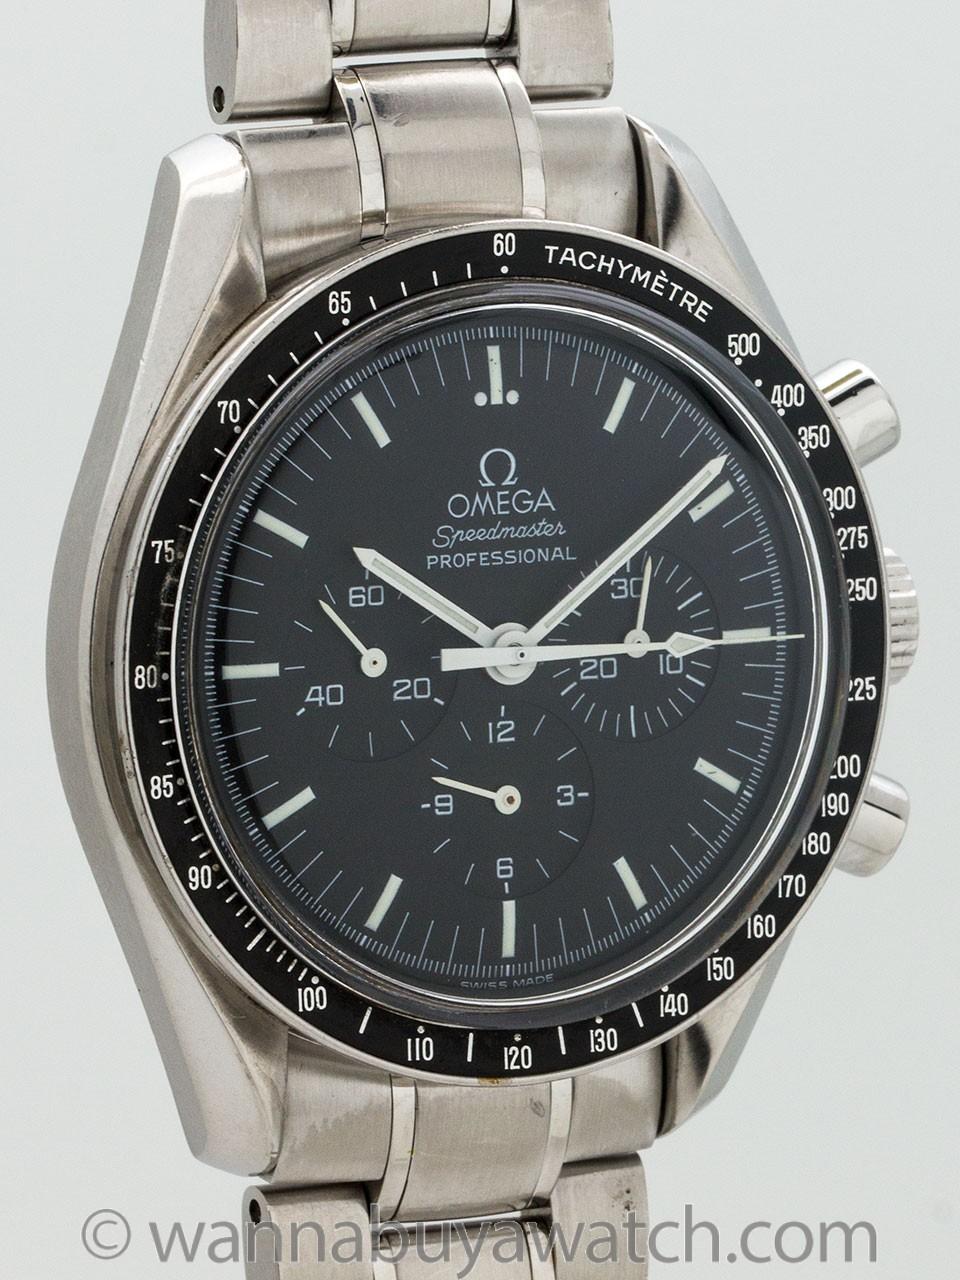 Omega Speedmaster Man on the Moon Apollo 11 30th Anniversary Edition circa 1999